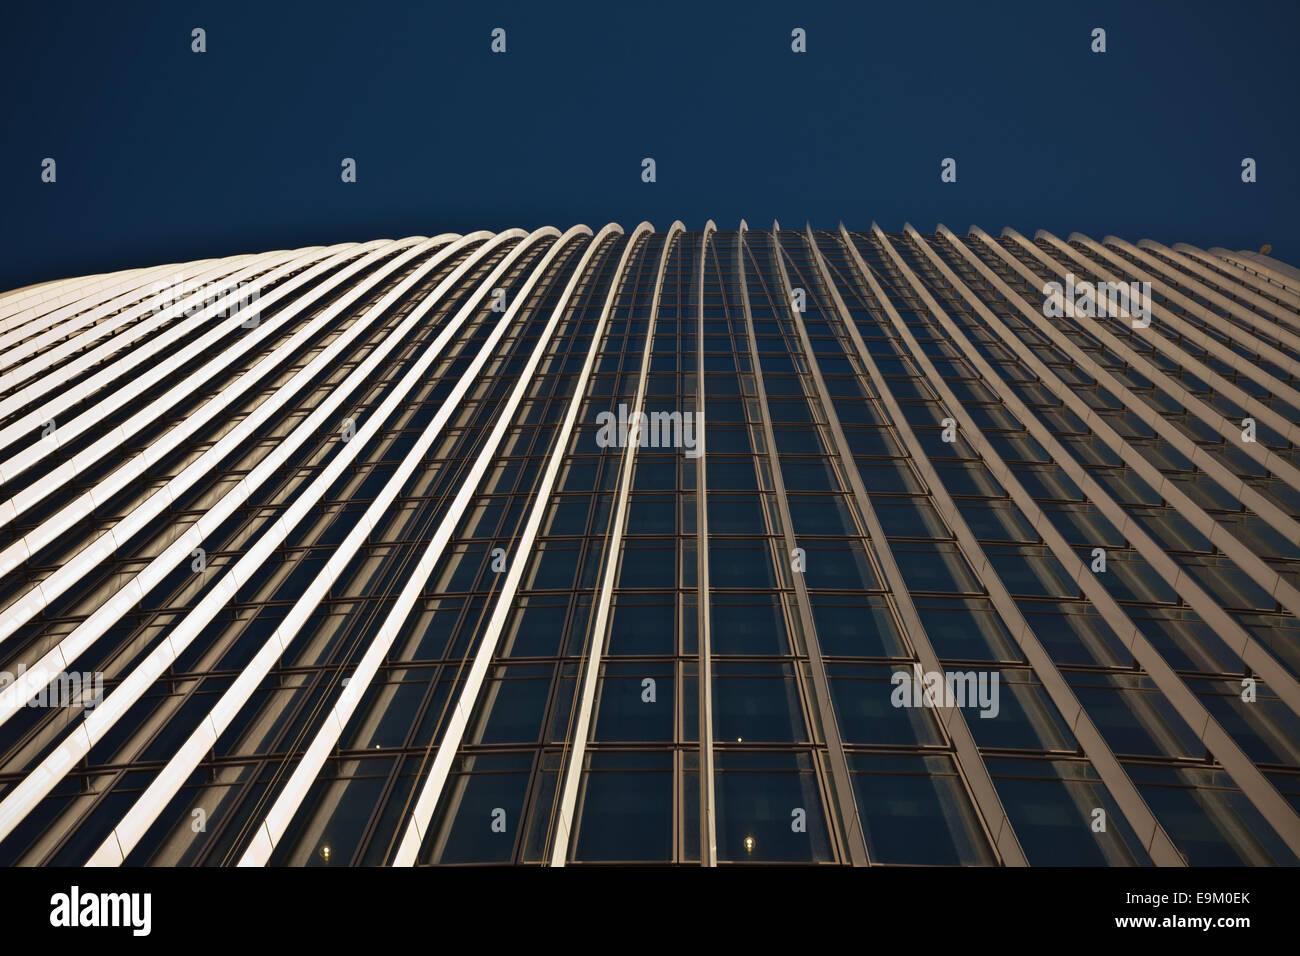 20 Fenchurch Street, London, UK the ealkie talkie building - Stock Image